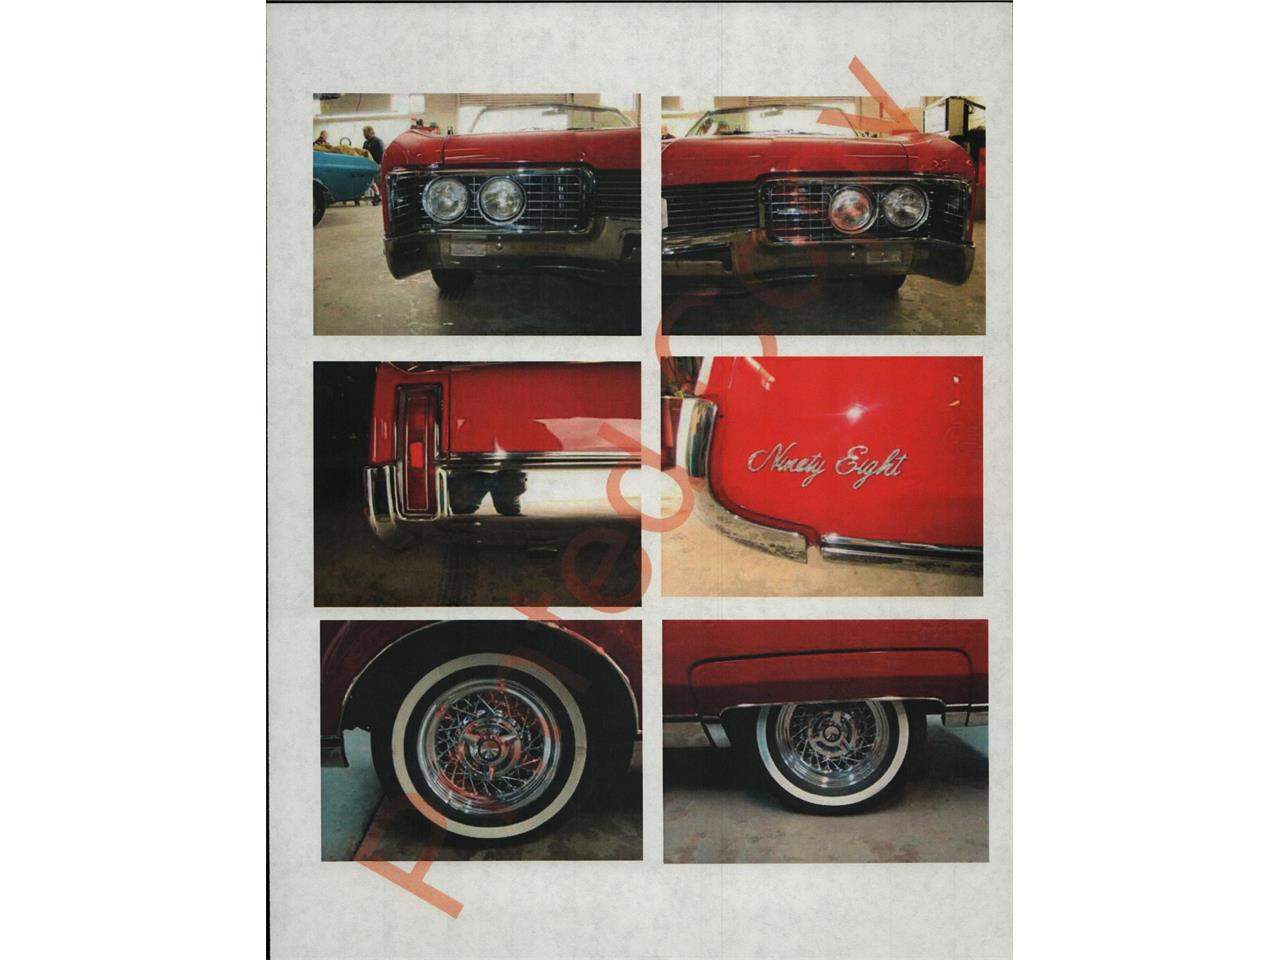 Large Picture of Classic '67 98 located in GILBERT Arizona - $28,500.00 - QIZI